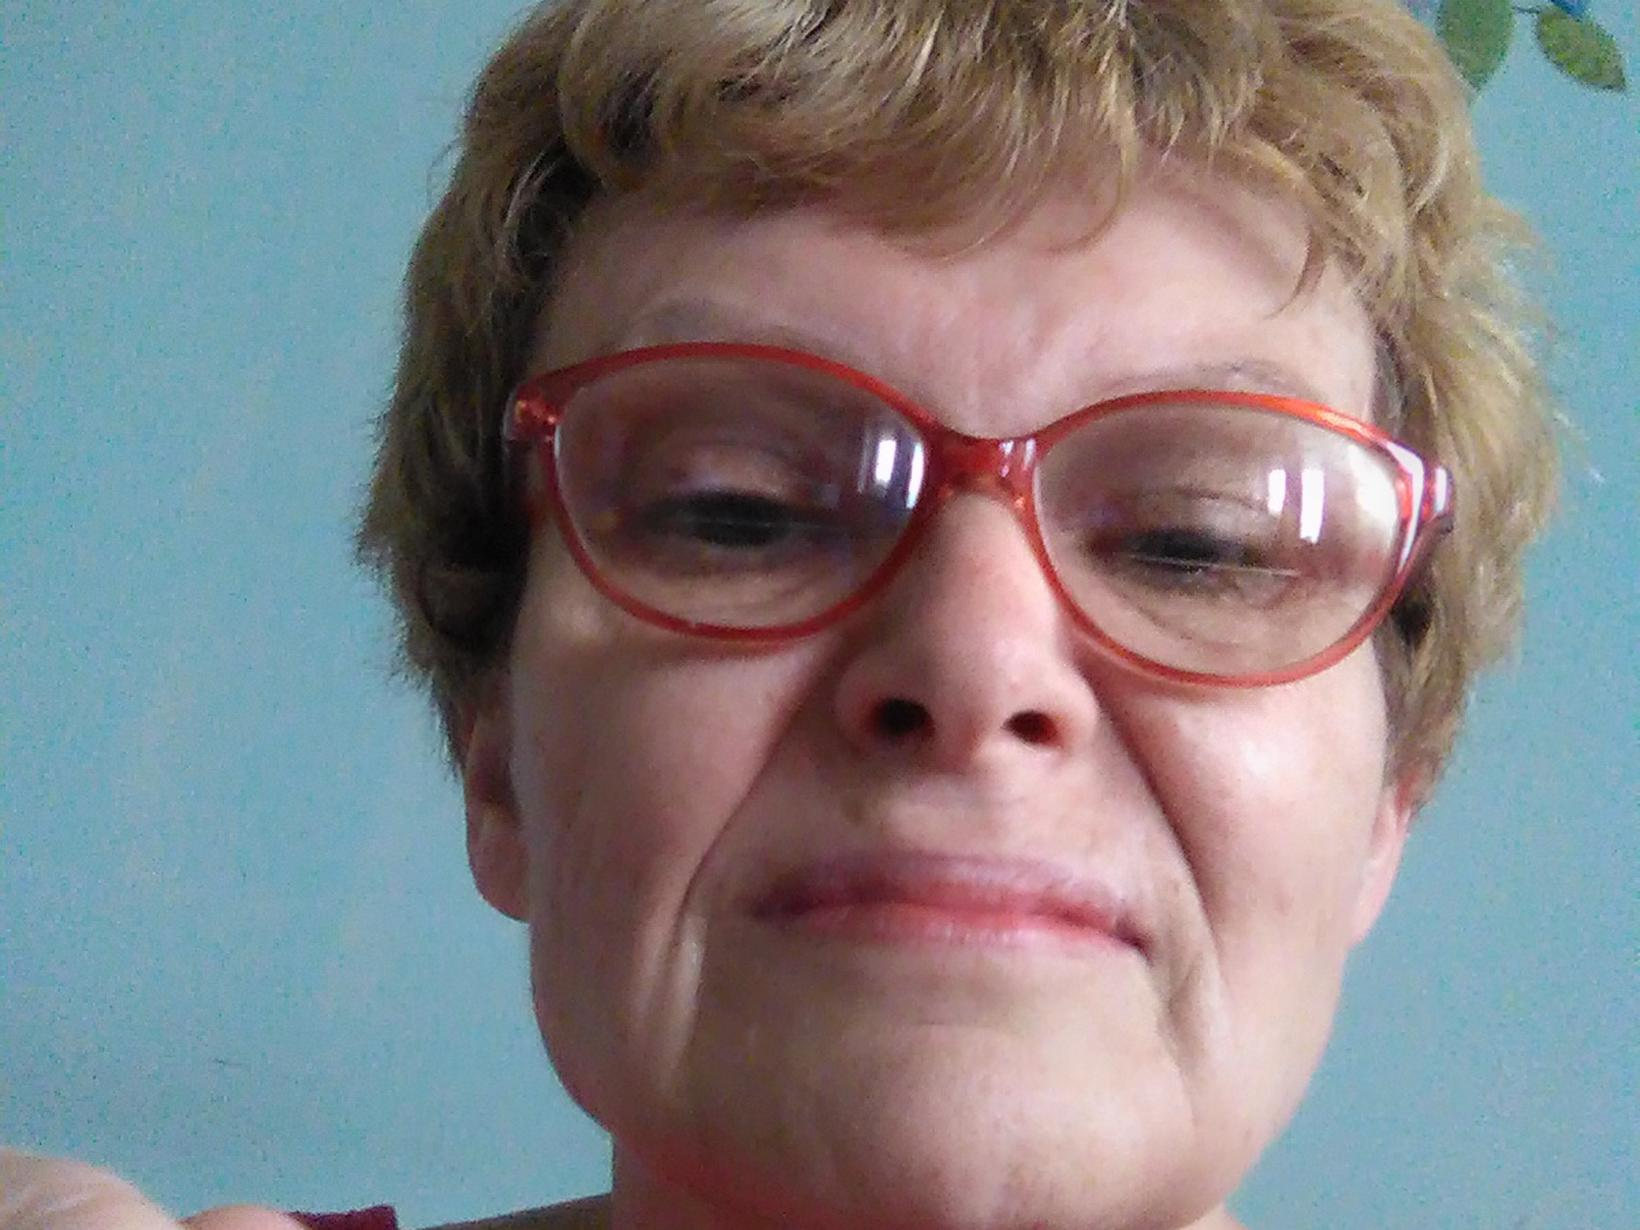 Arlene from Mississauga, Ontario, Canada